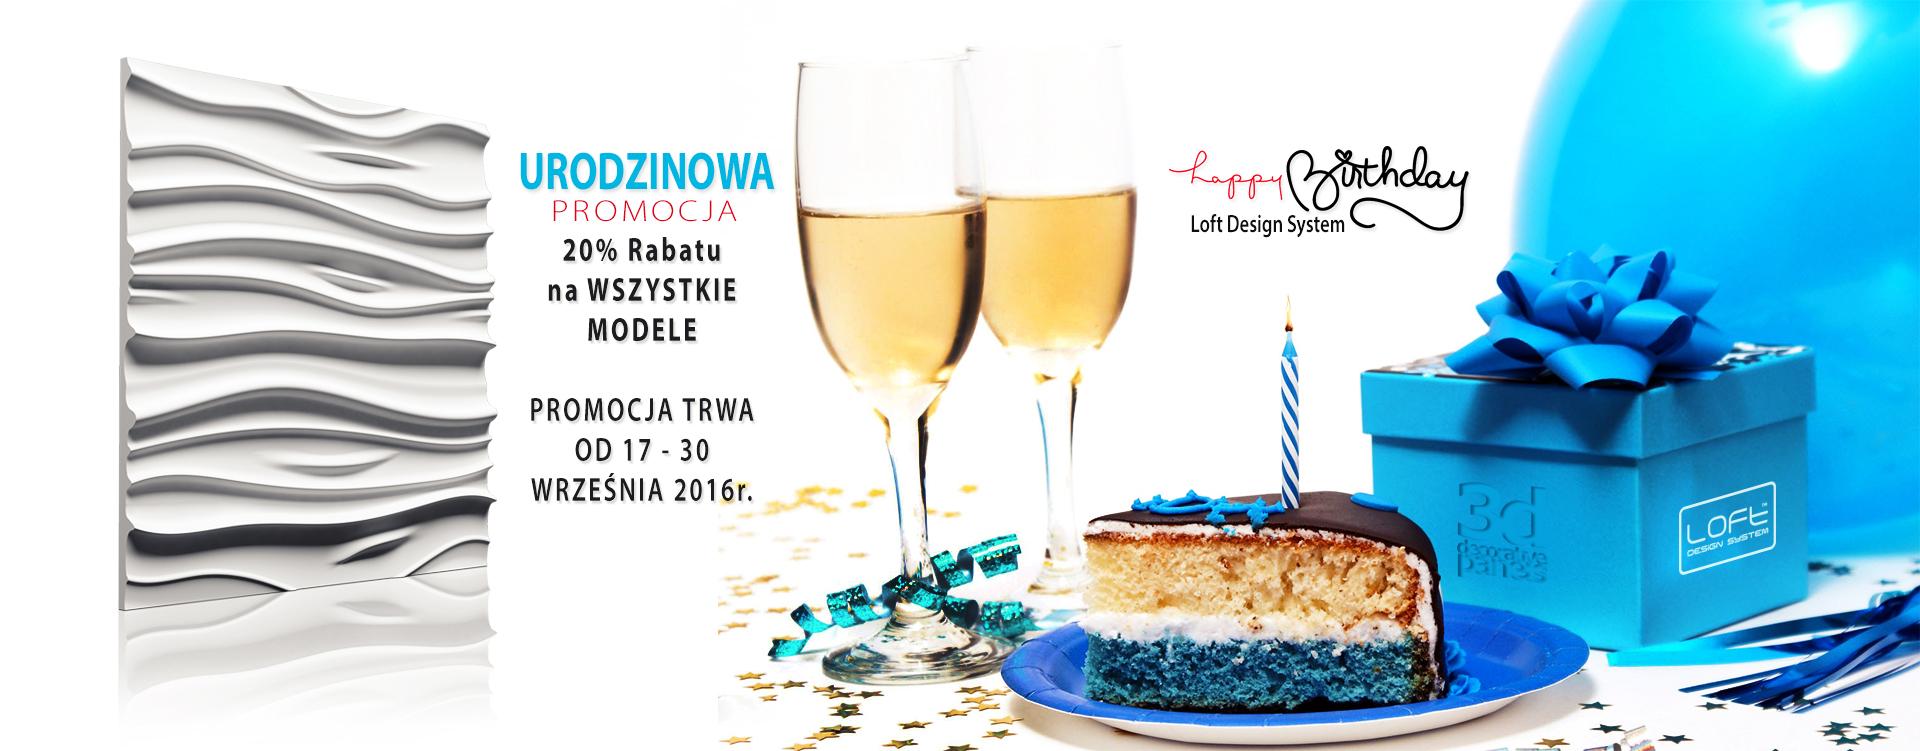 urodzinyloft-designpl